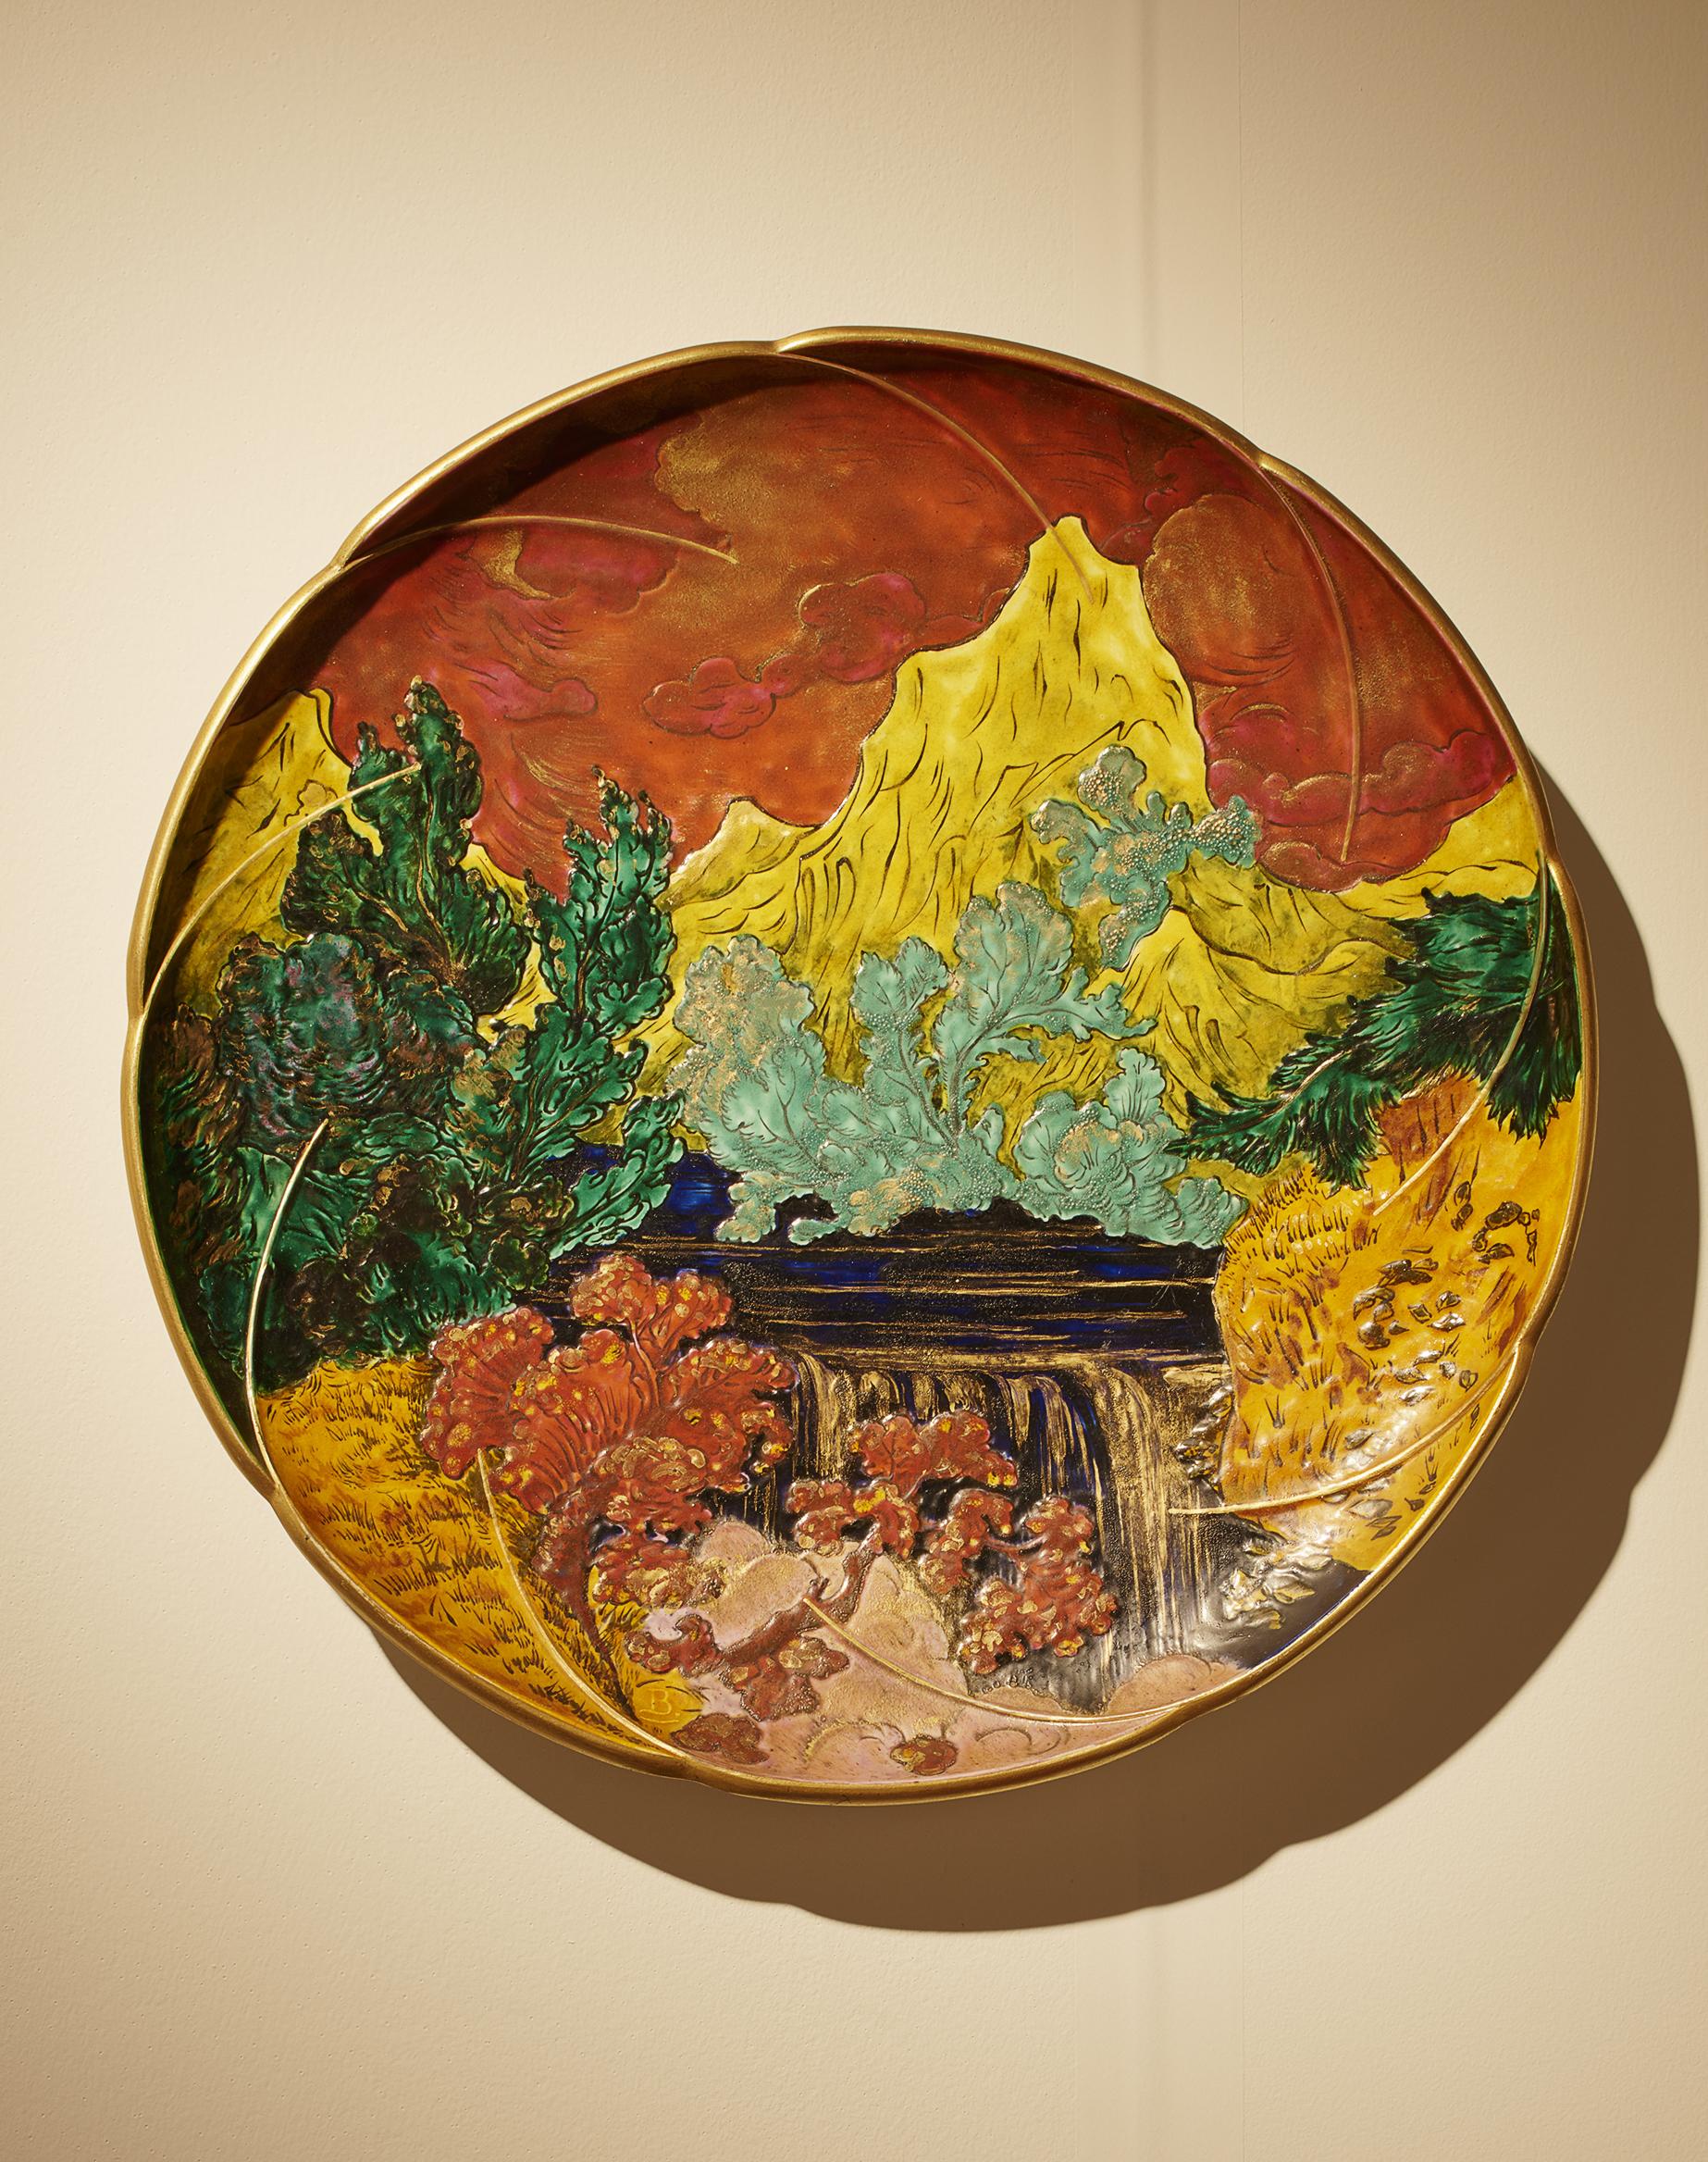 Robert Zehil Gallery - Design Miami/Basel 2018  Important plate 'Landscape', Felix Bracquemond, cca 1874 - 76 Hard paste porcelain, manufactured at Halivand & Cie in the Auteuil workshop 50 cm dimaeter; Monogrammed B ⓒ  James Harris